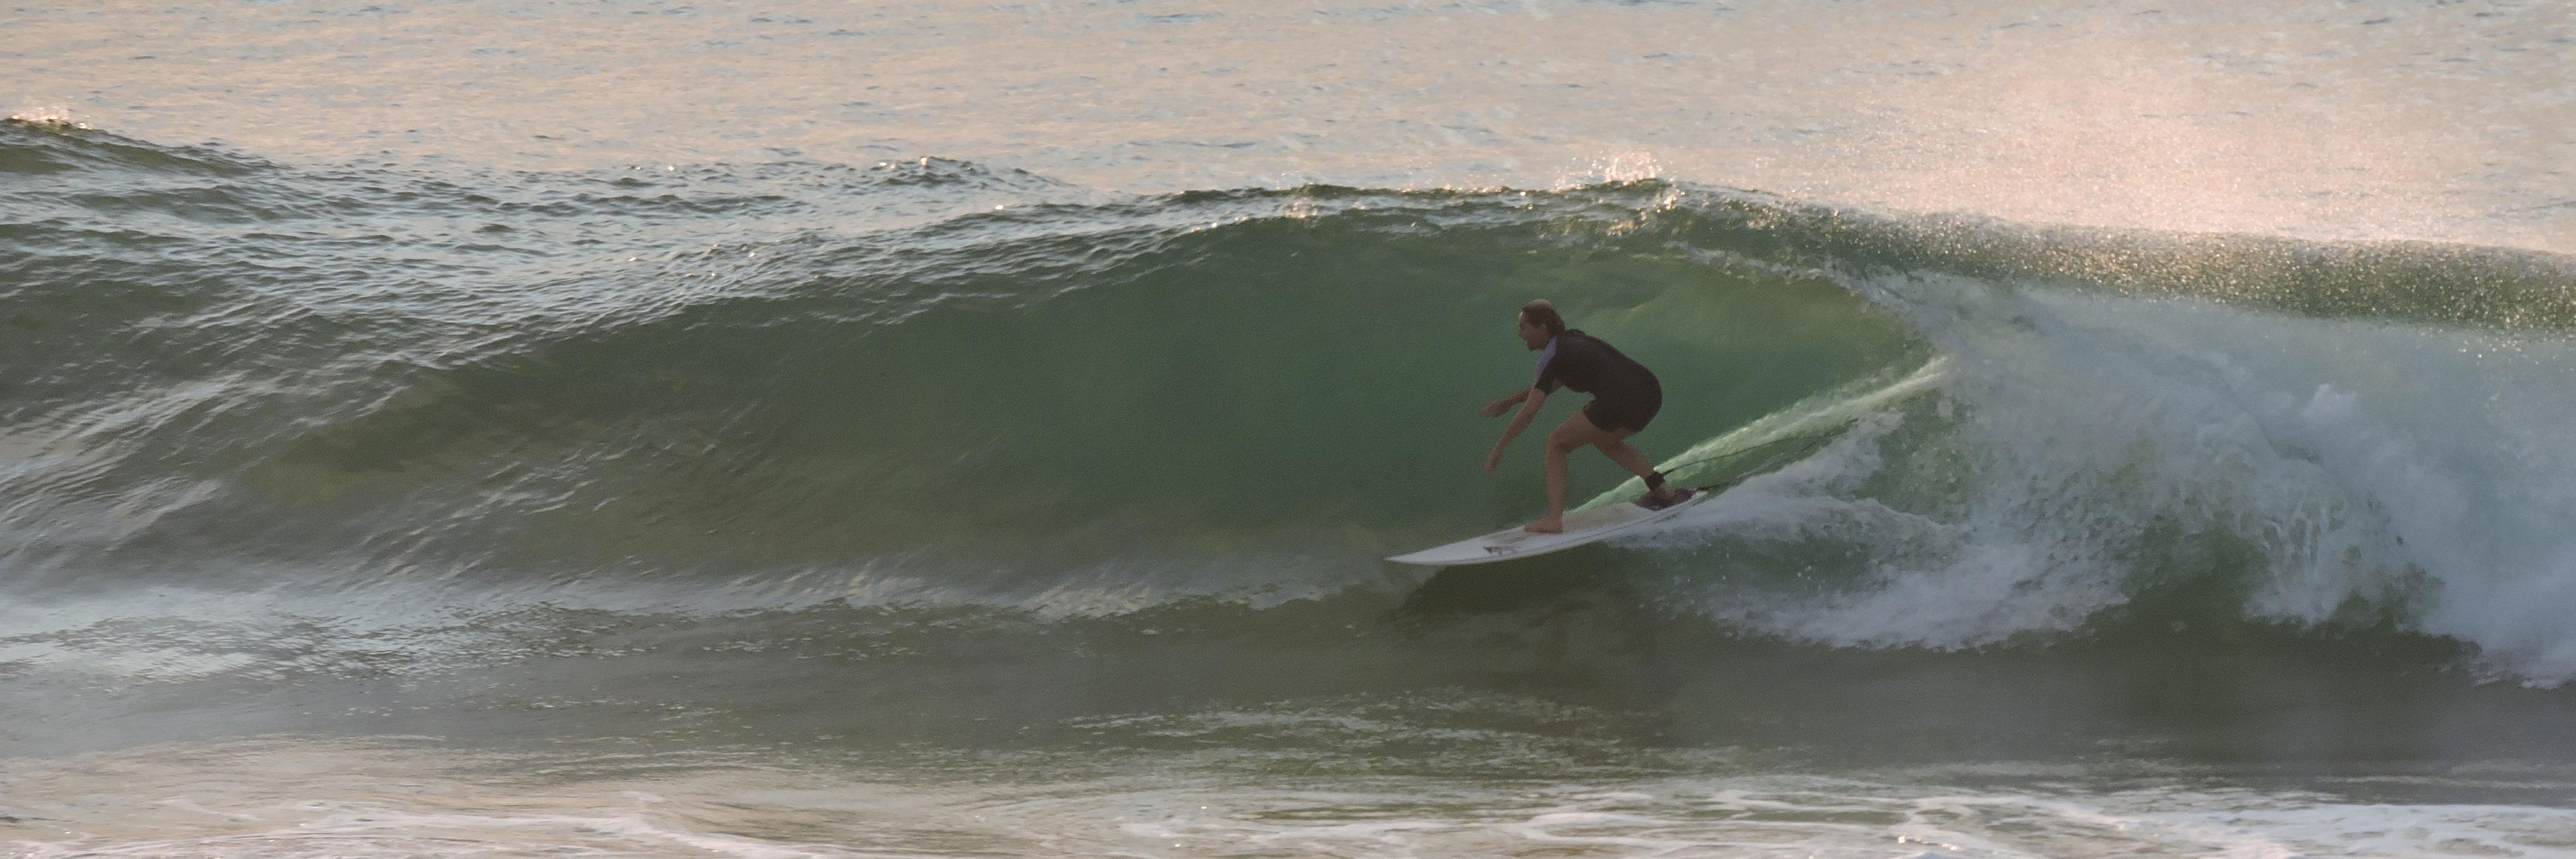 surf-bakio-2015-131